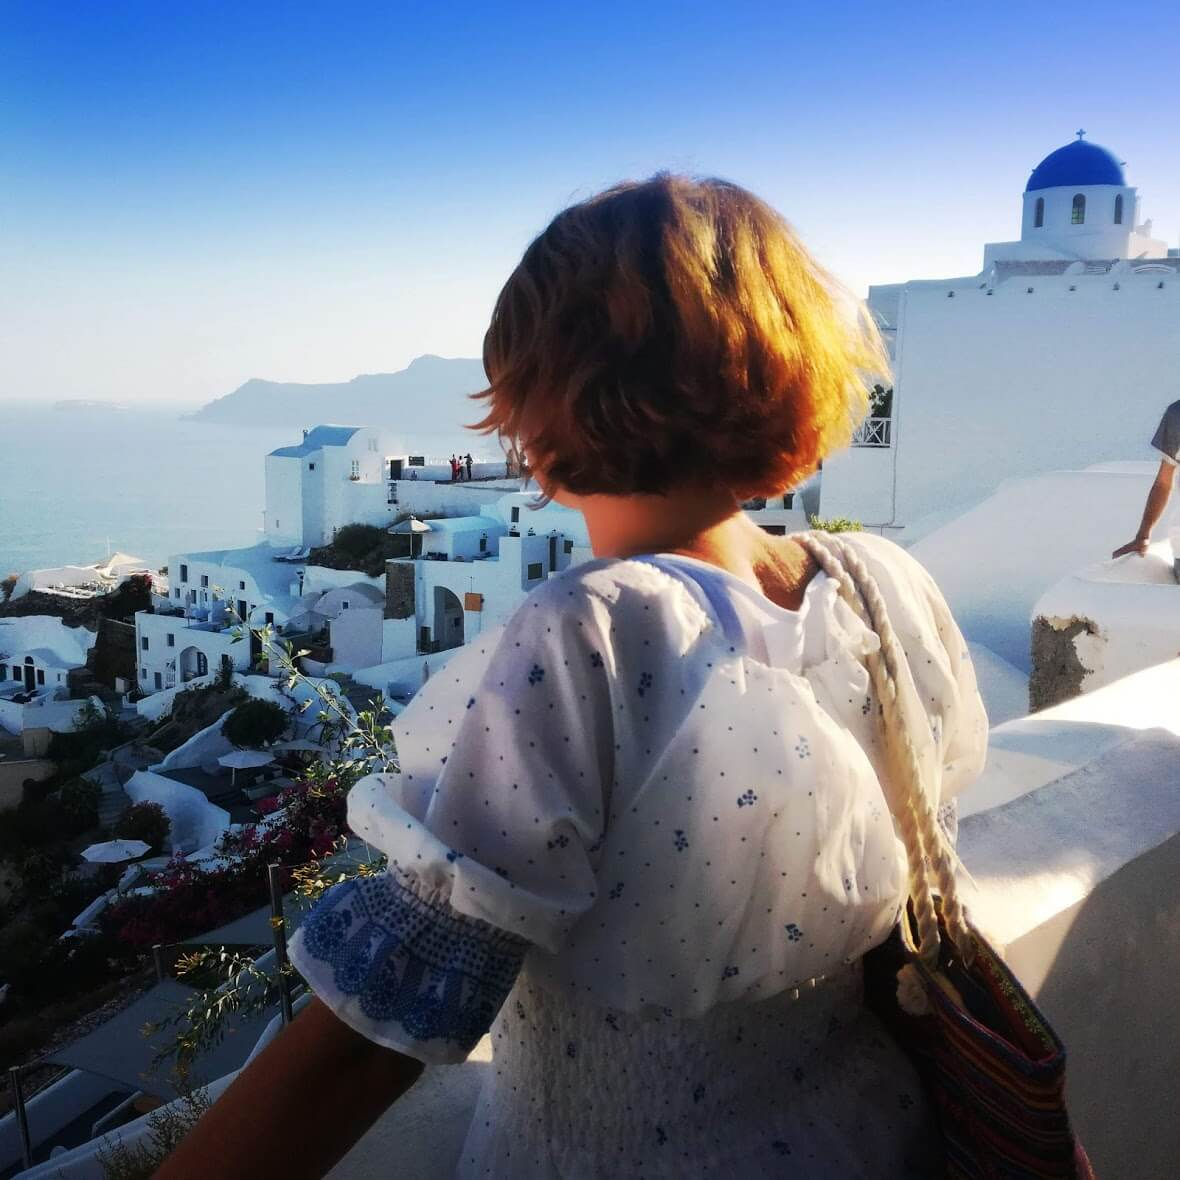 Santorini: Jak na slow travel v mega turistické destinaci